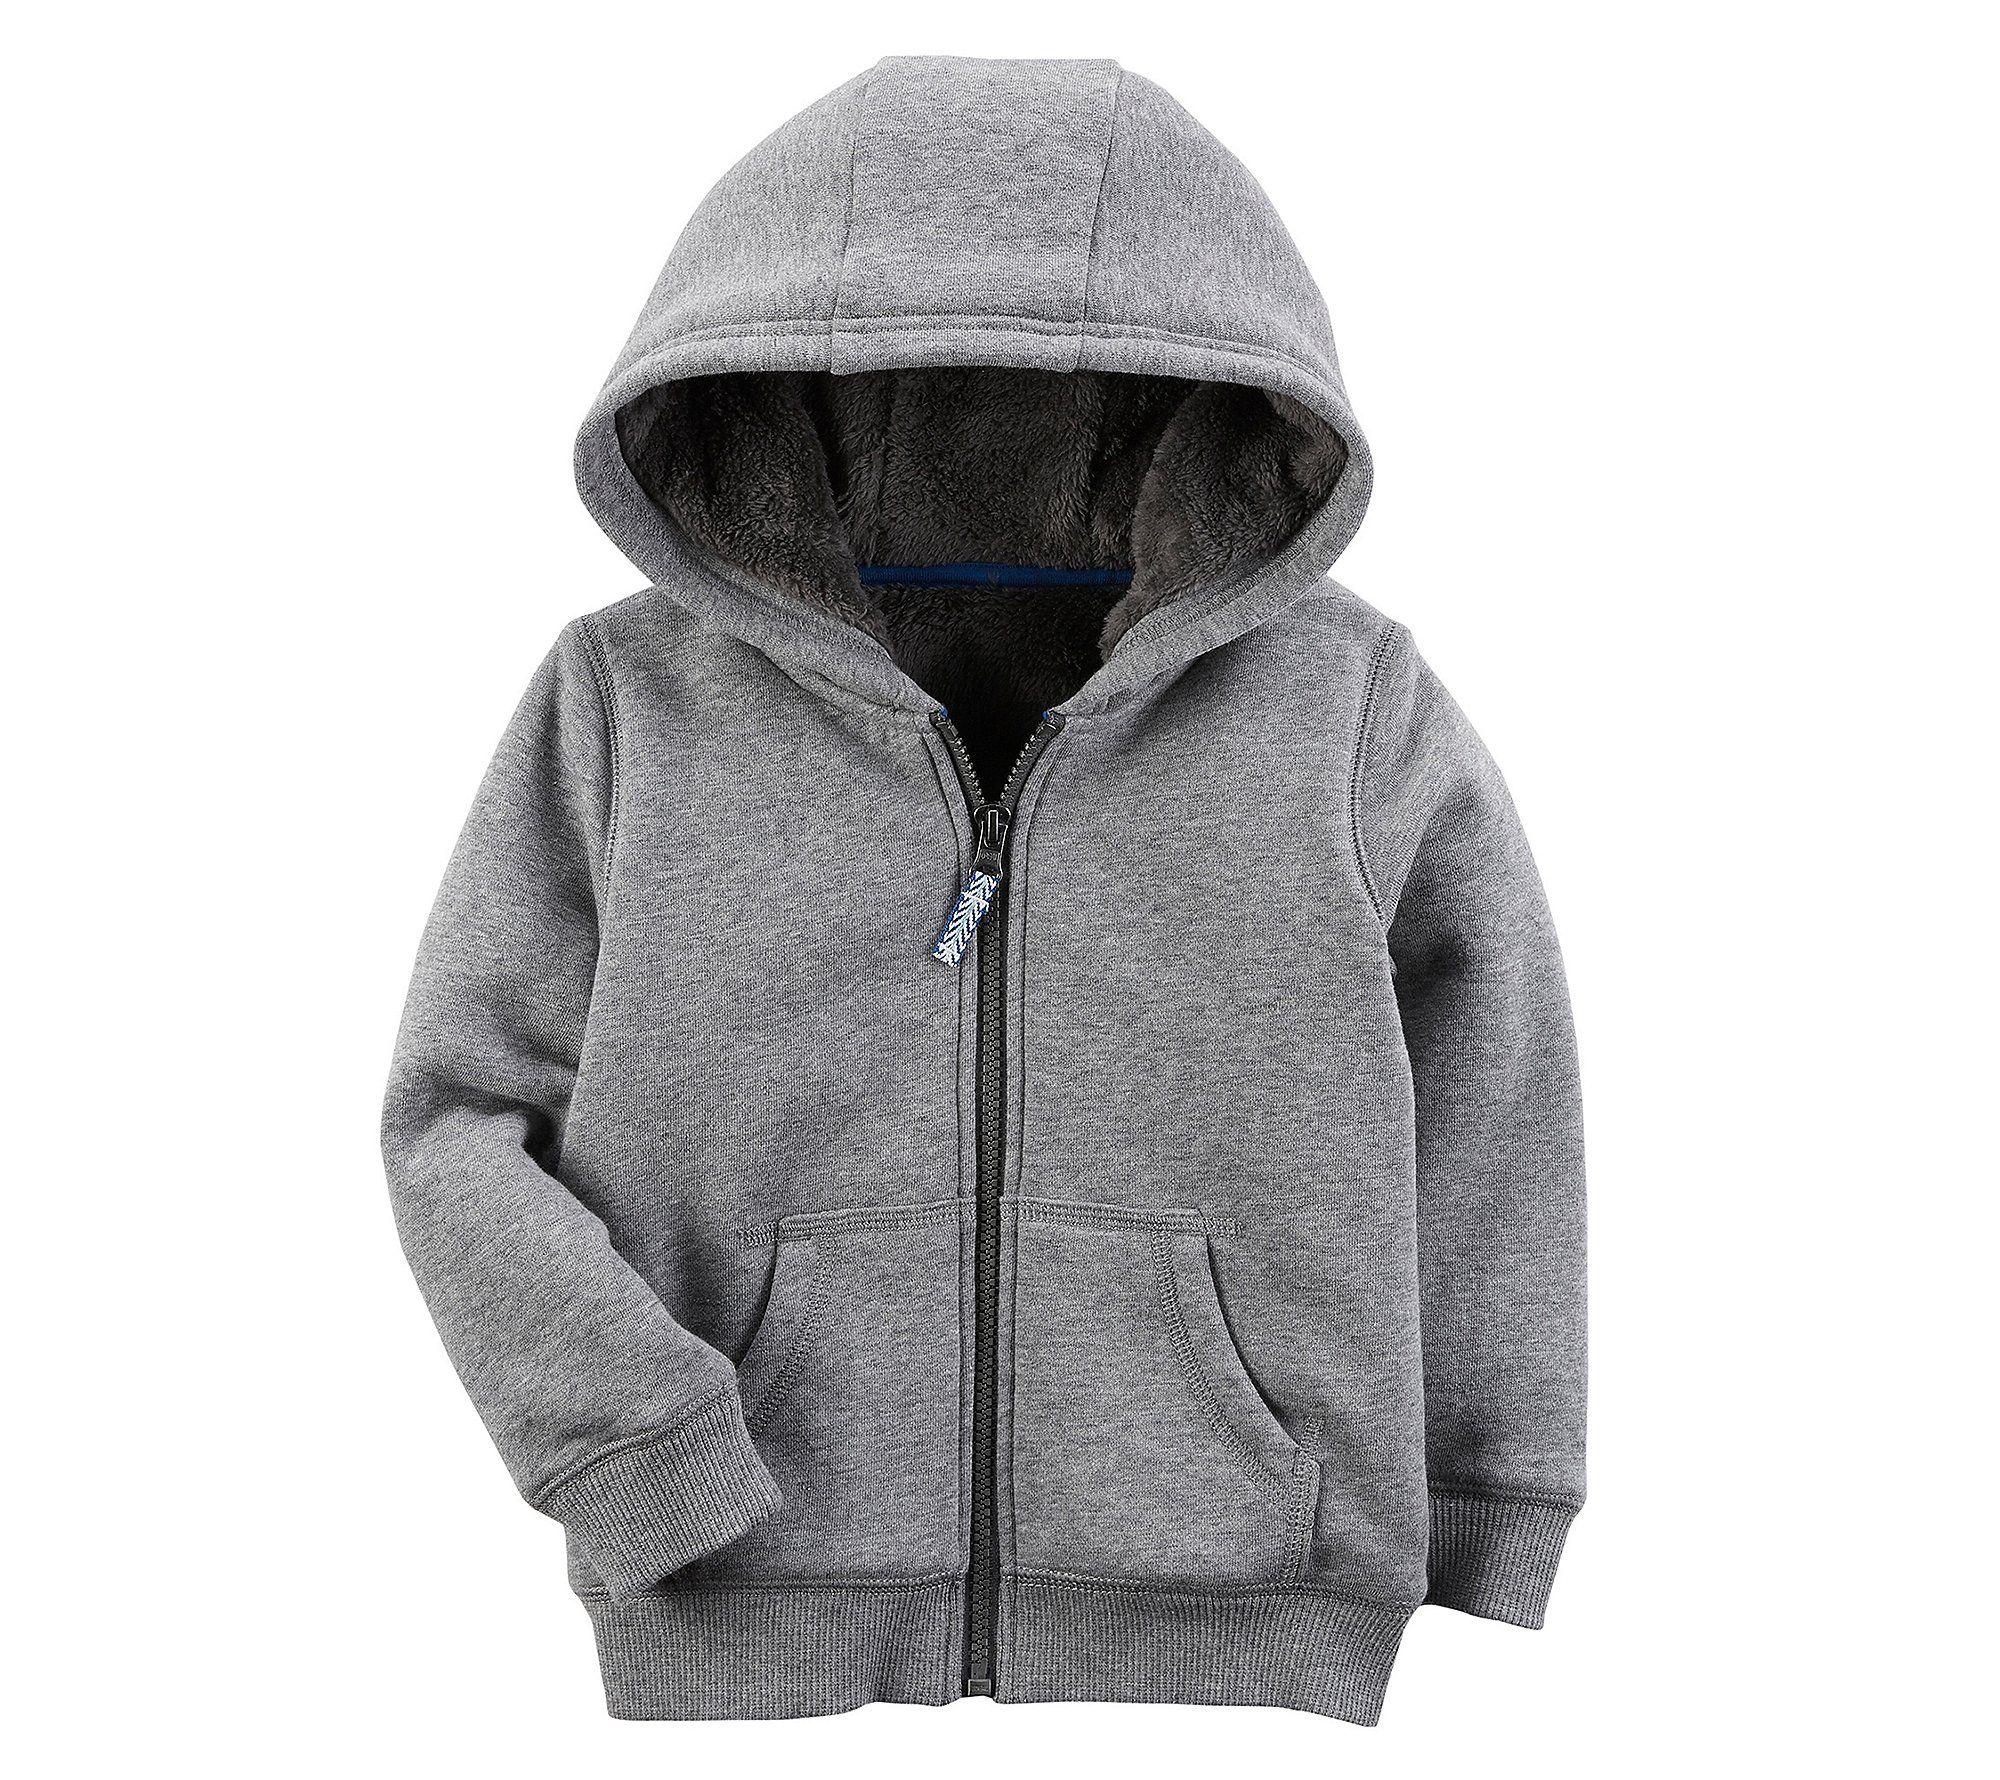 Boys Hoodie Hooded Cotton Zip Up Jackets Long Sleeve Sweatshirt Coat Jacket 4-8 Years